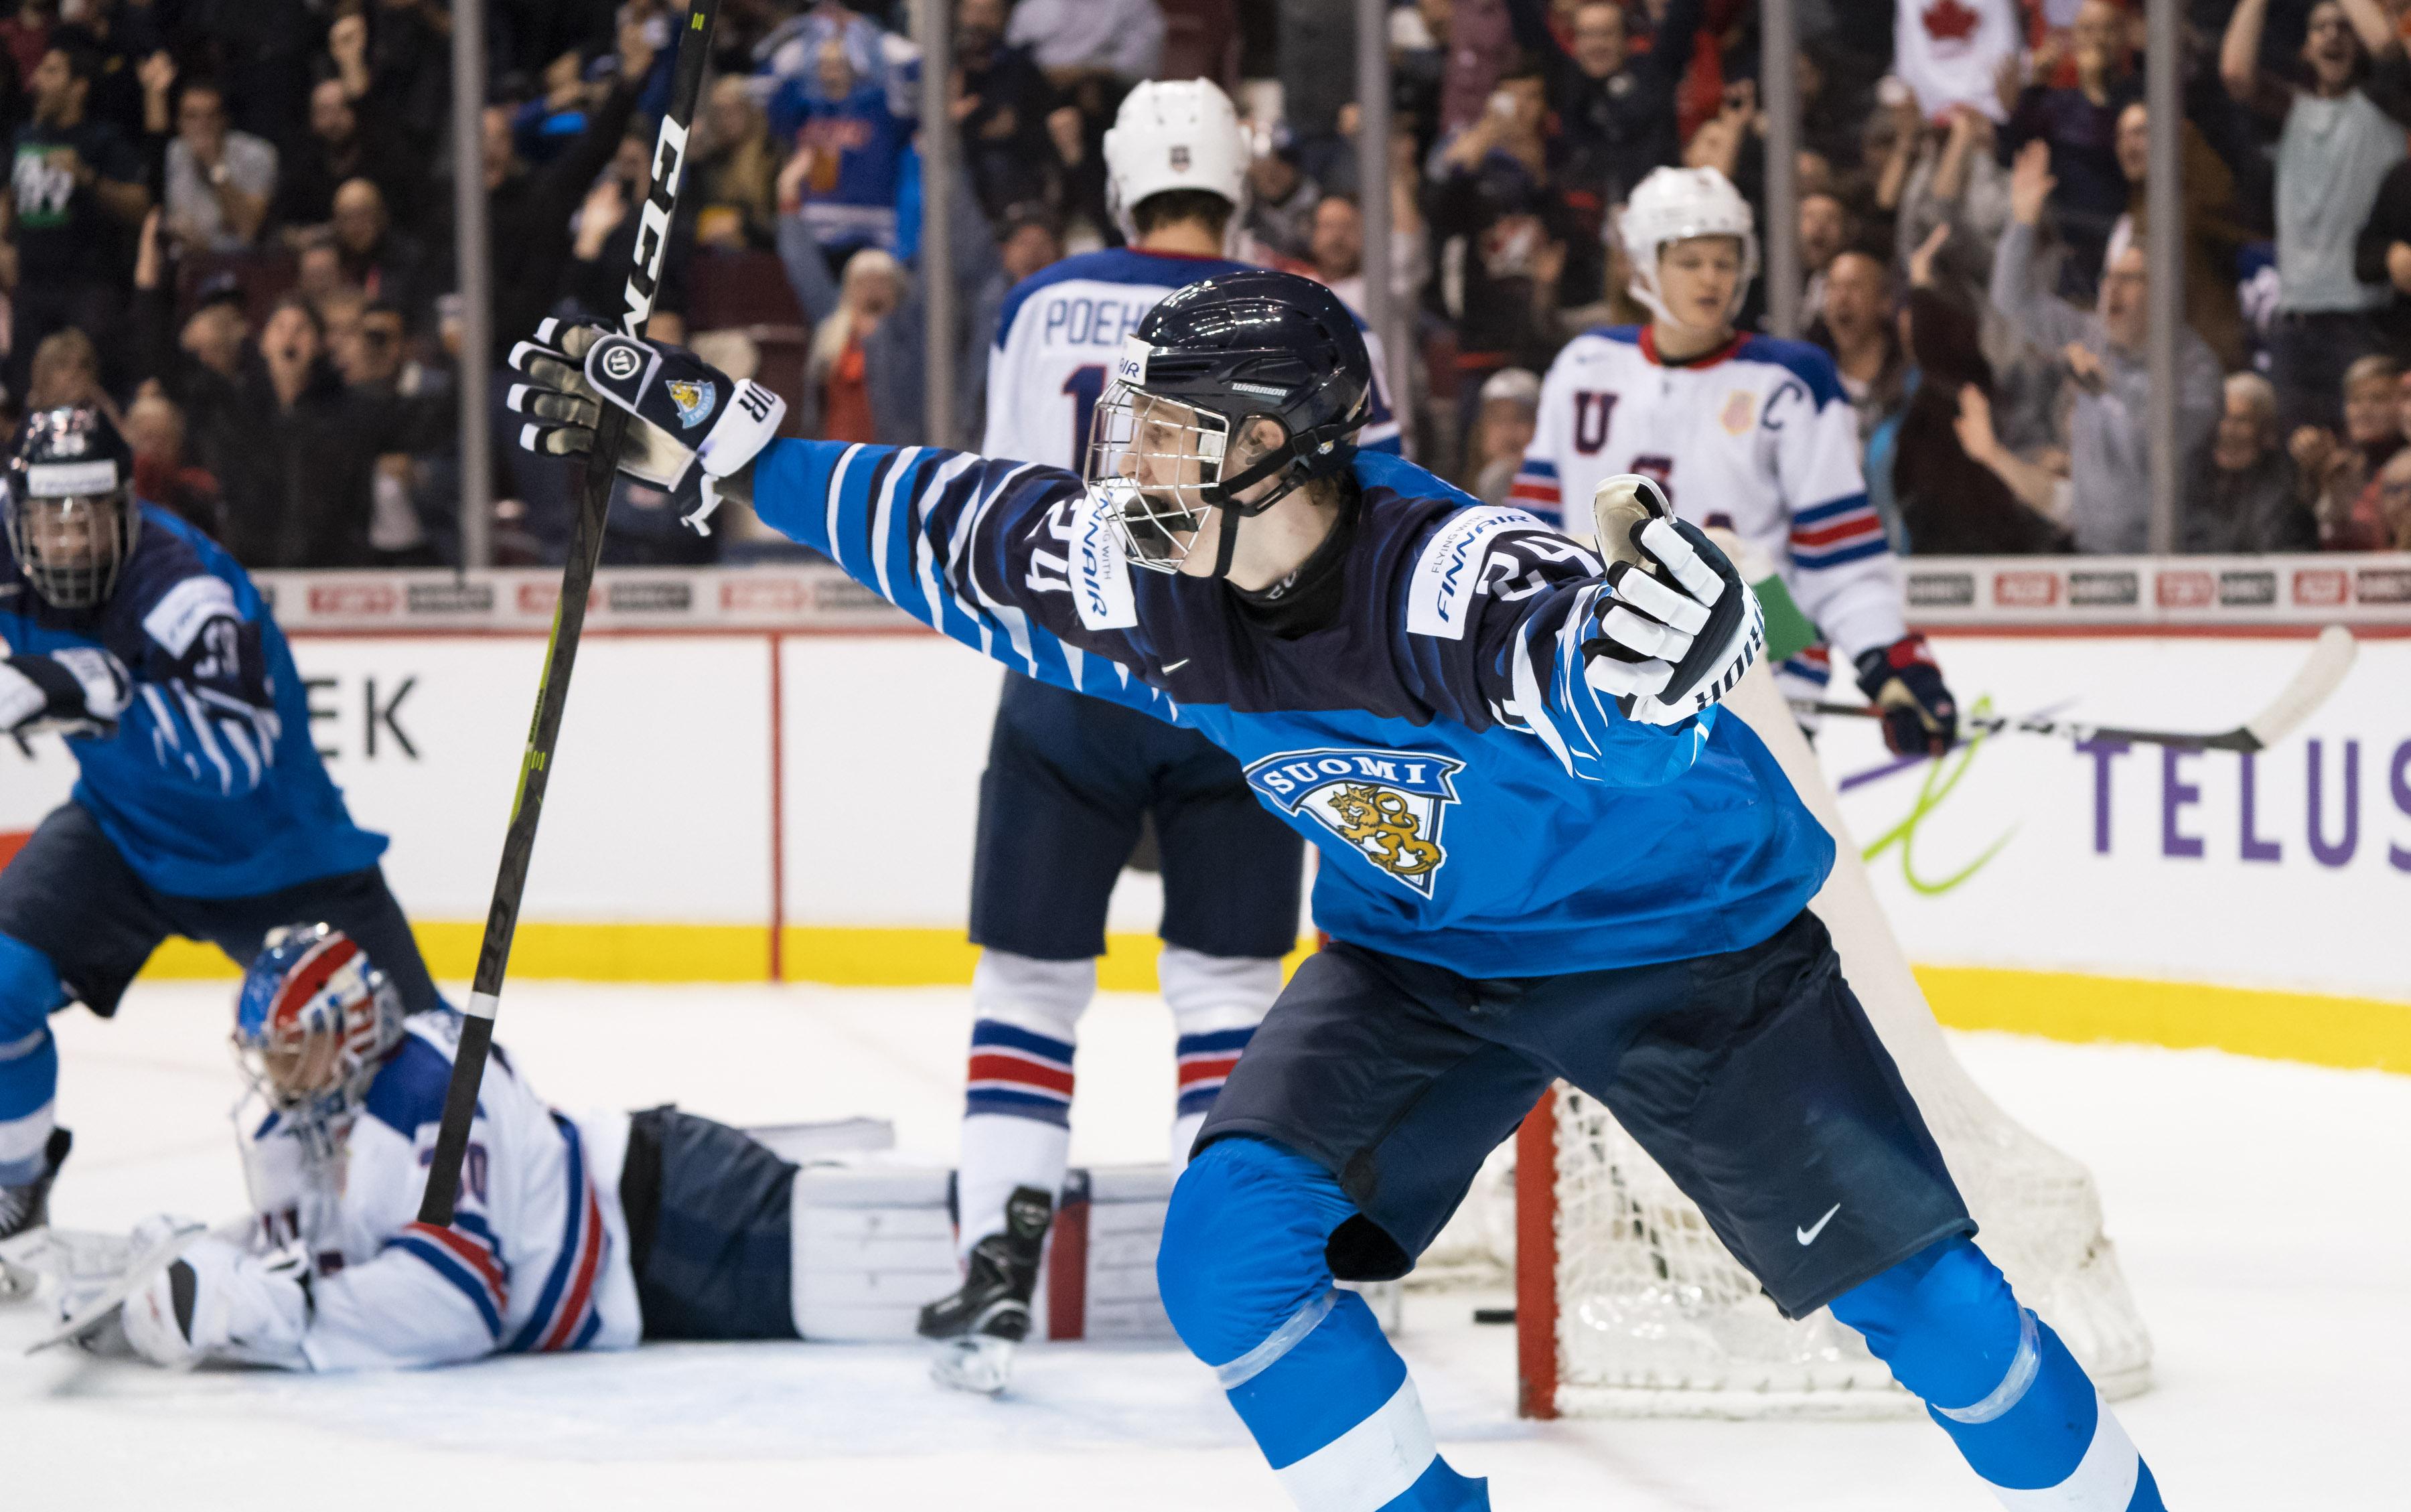 Finland v United States: Gold Medal Game - 2019 IIHF World Junior Championship